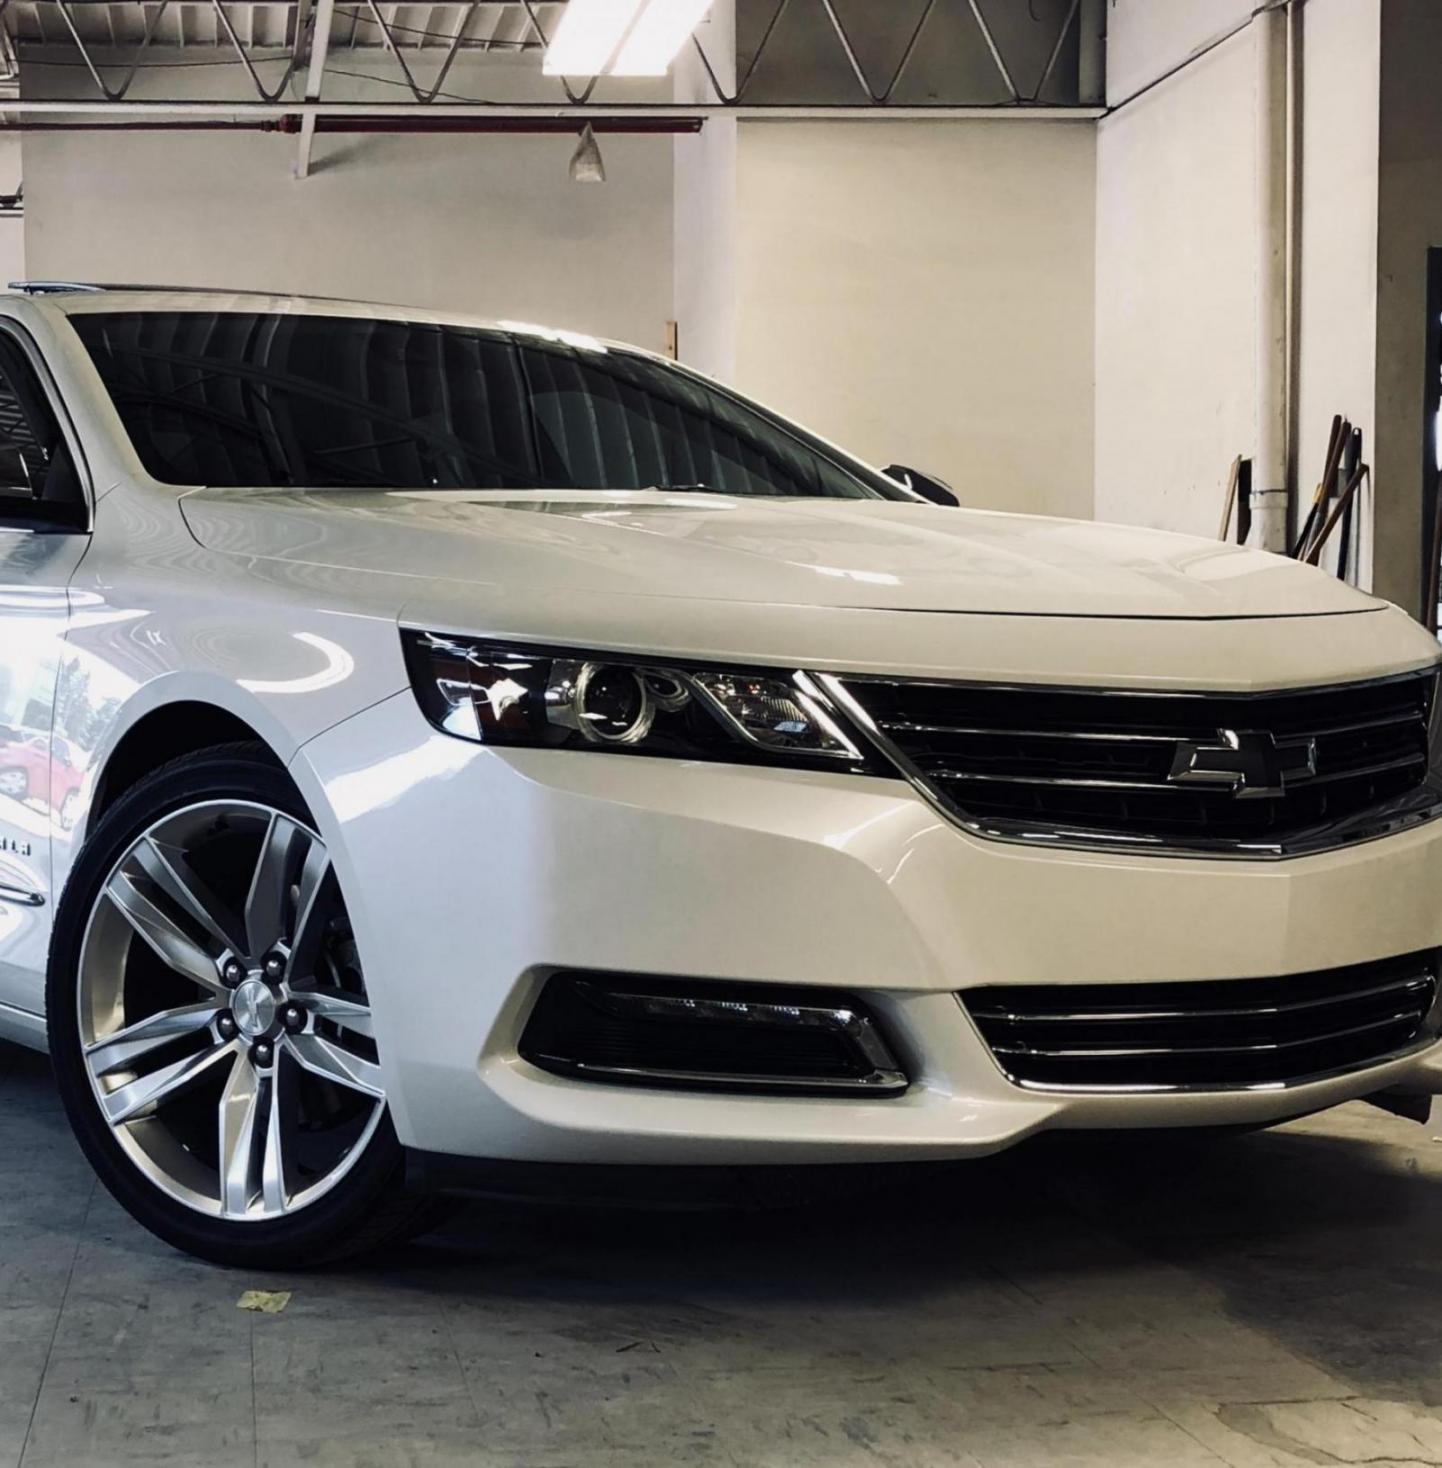 Hello Epsilon II- 2014 Impala LTZ-907b57a6-04de-477f-b845-3f25170f7d6c_1528040636715.jpeg